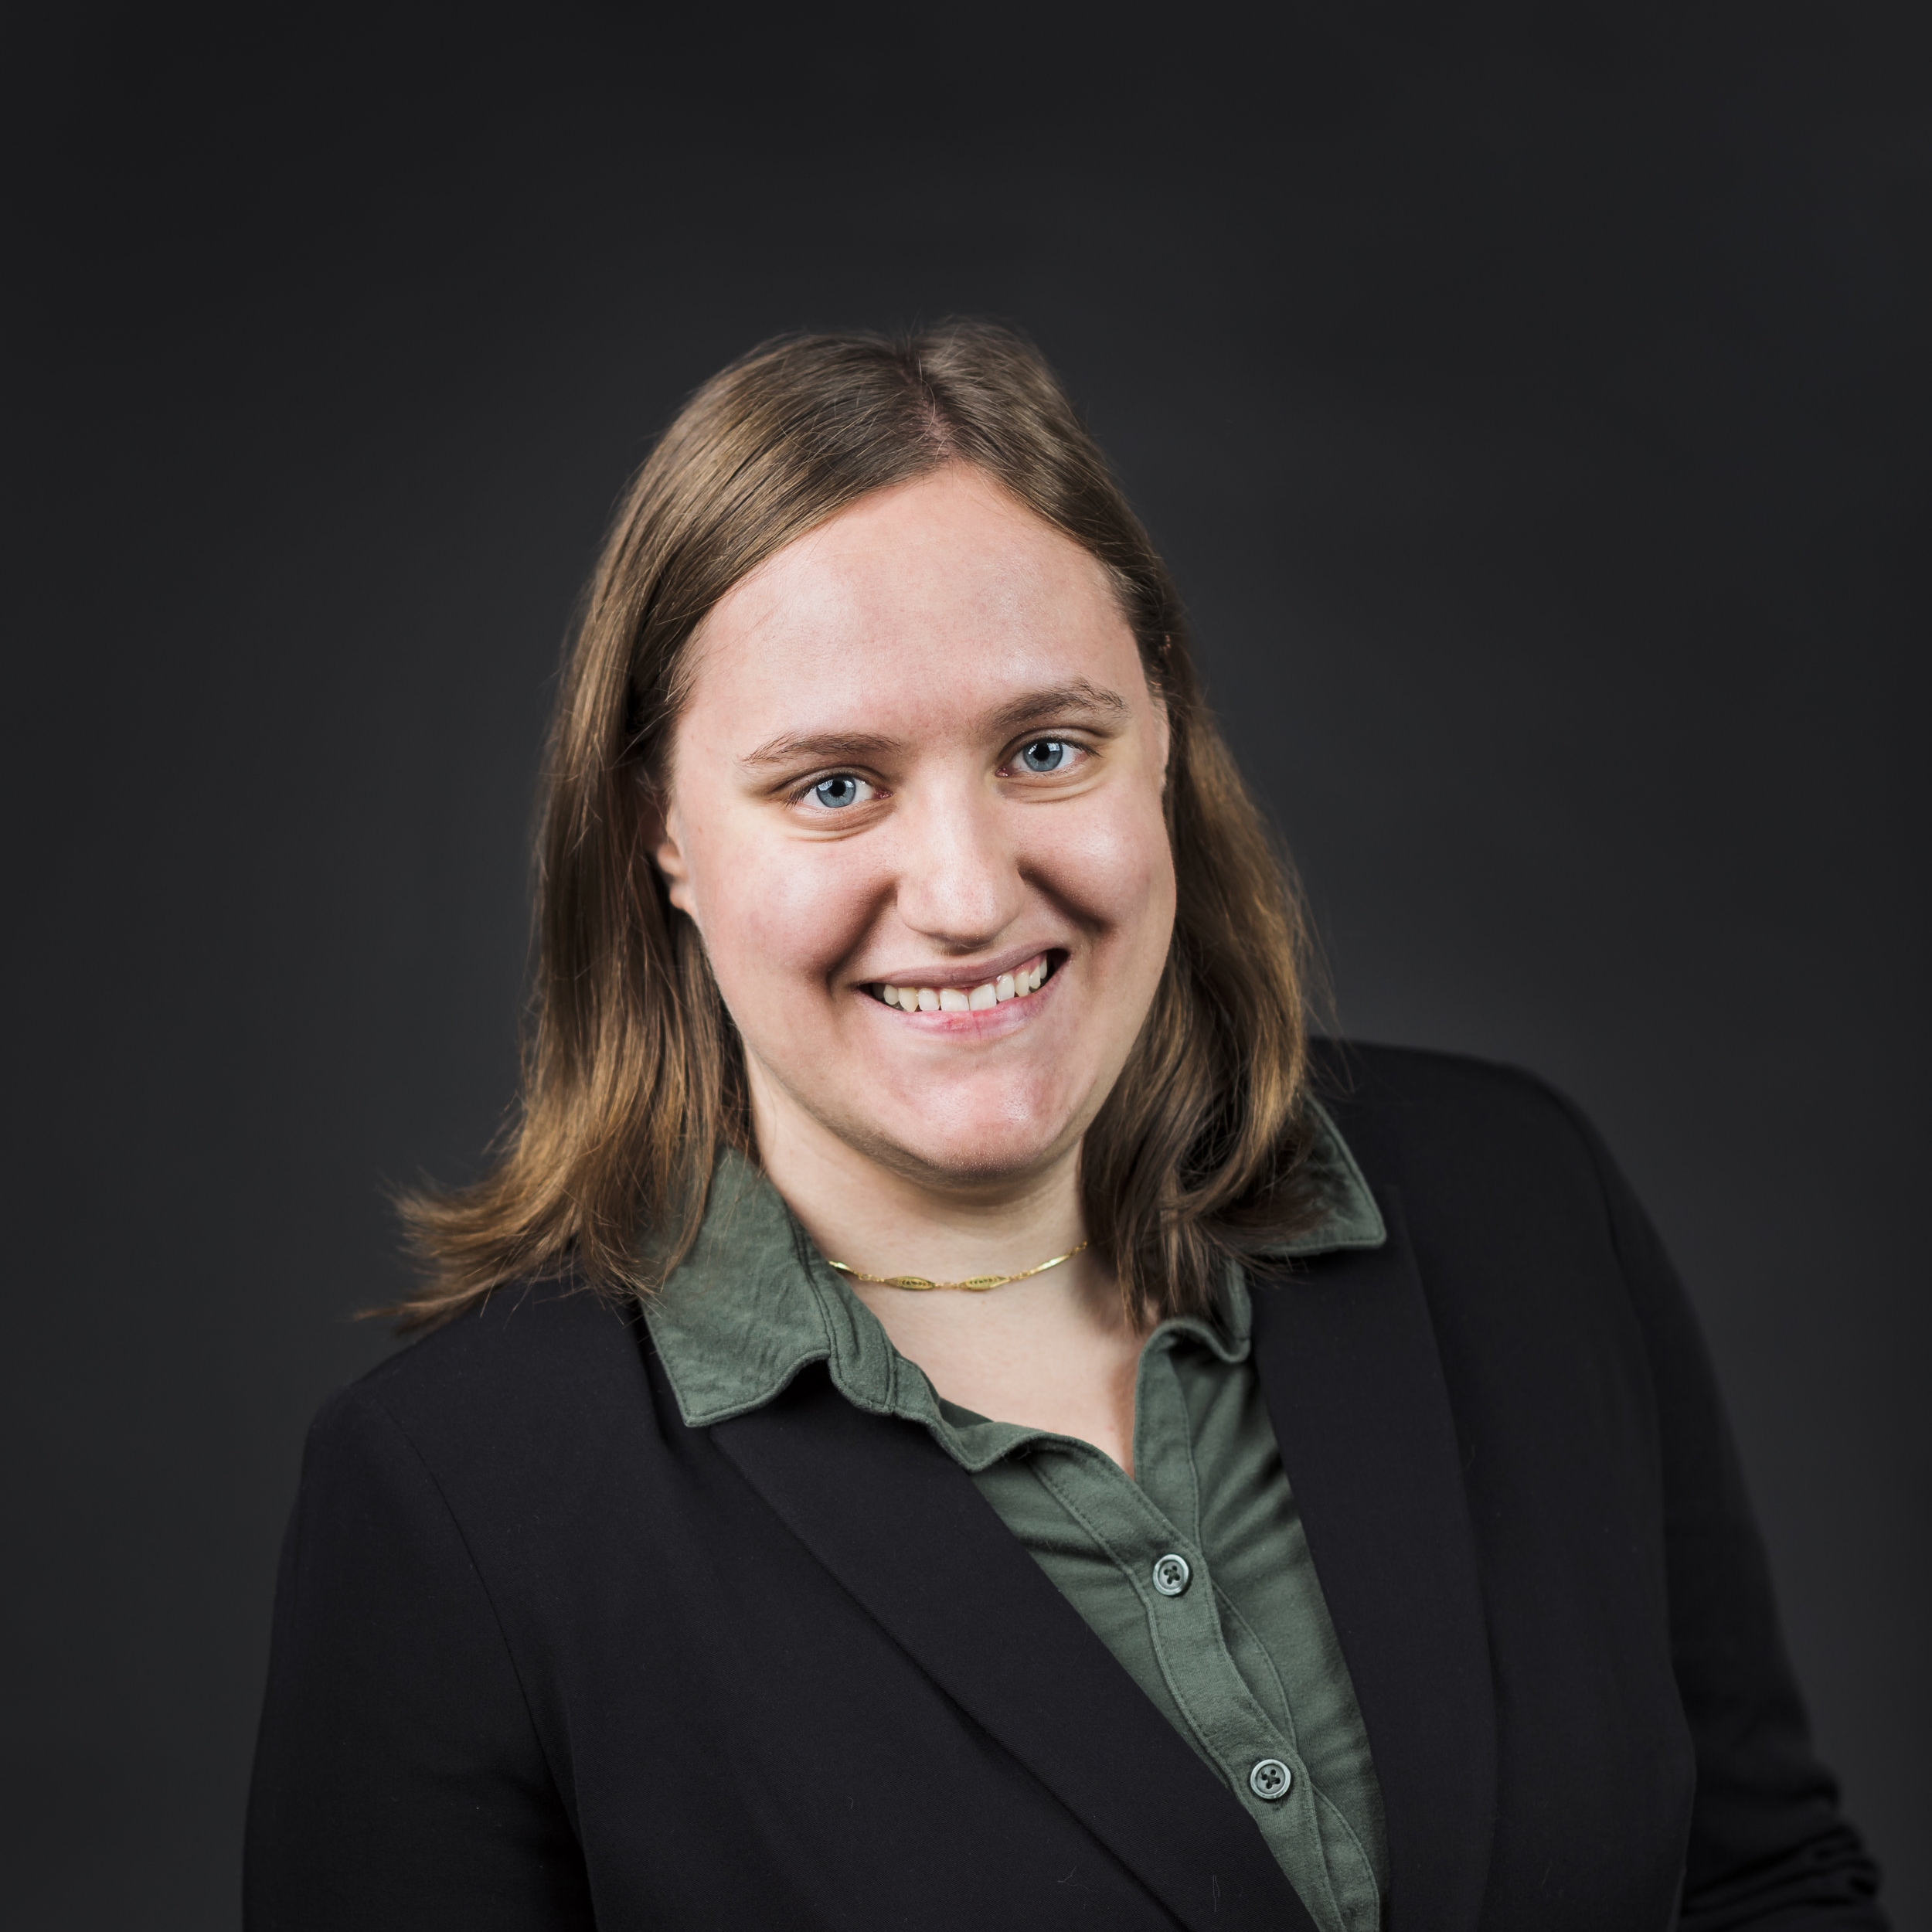 Jessie Raines - Mechanical Engineer